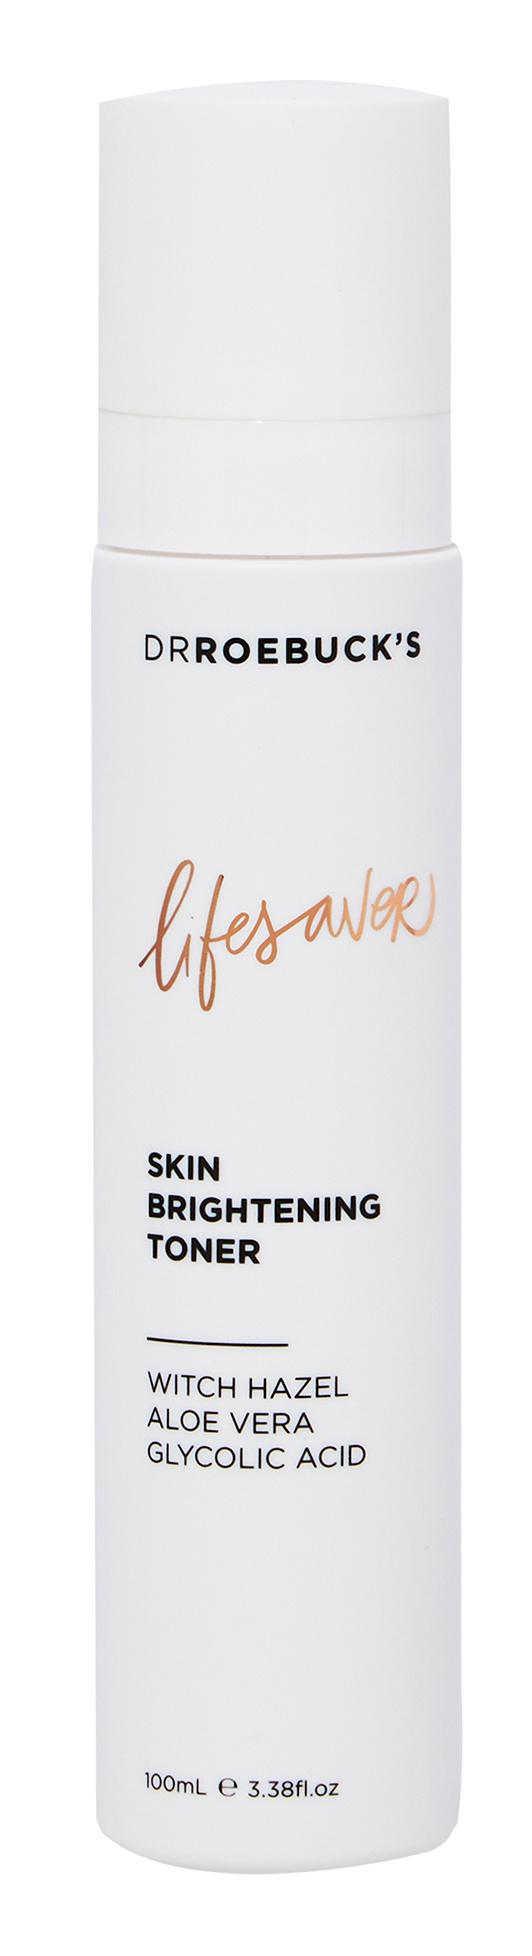 DR ROEBUCK'S Lifesaver Skin Brightening Toner